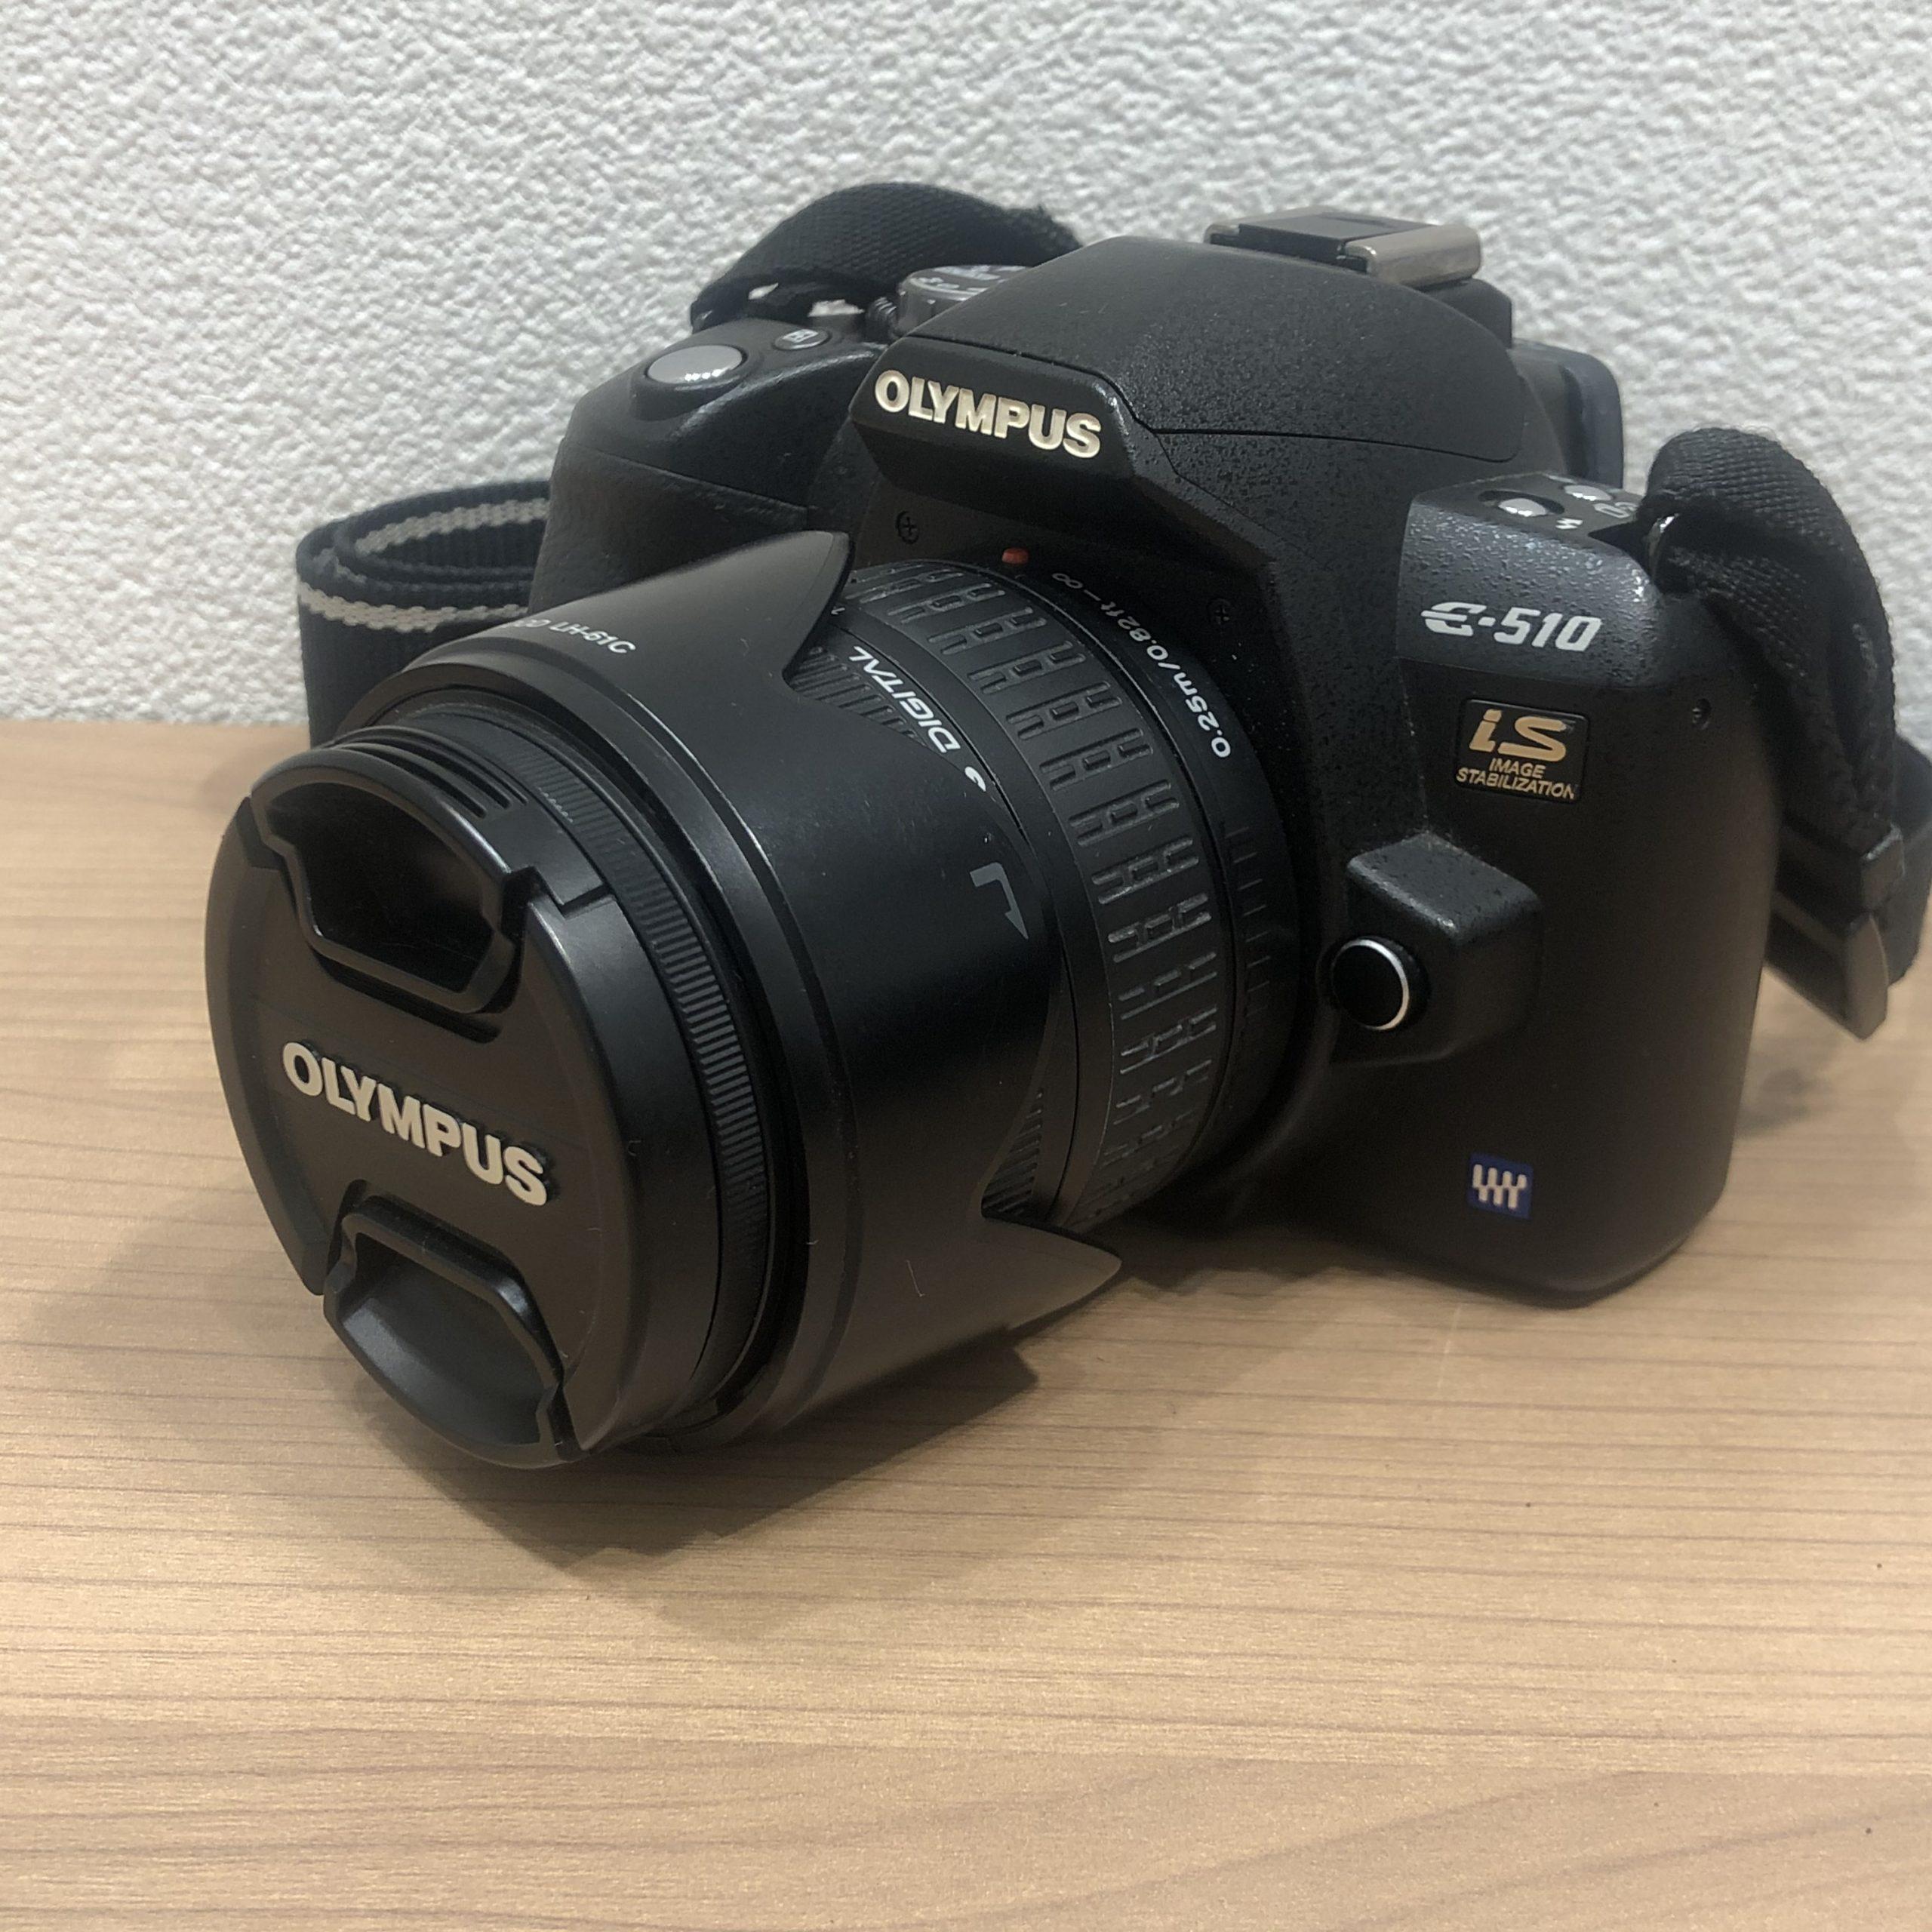 【OLYMPUS/オリンパス】E-510 デジタル一眼レフカメラ